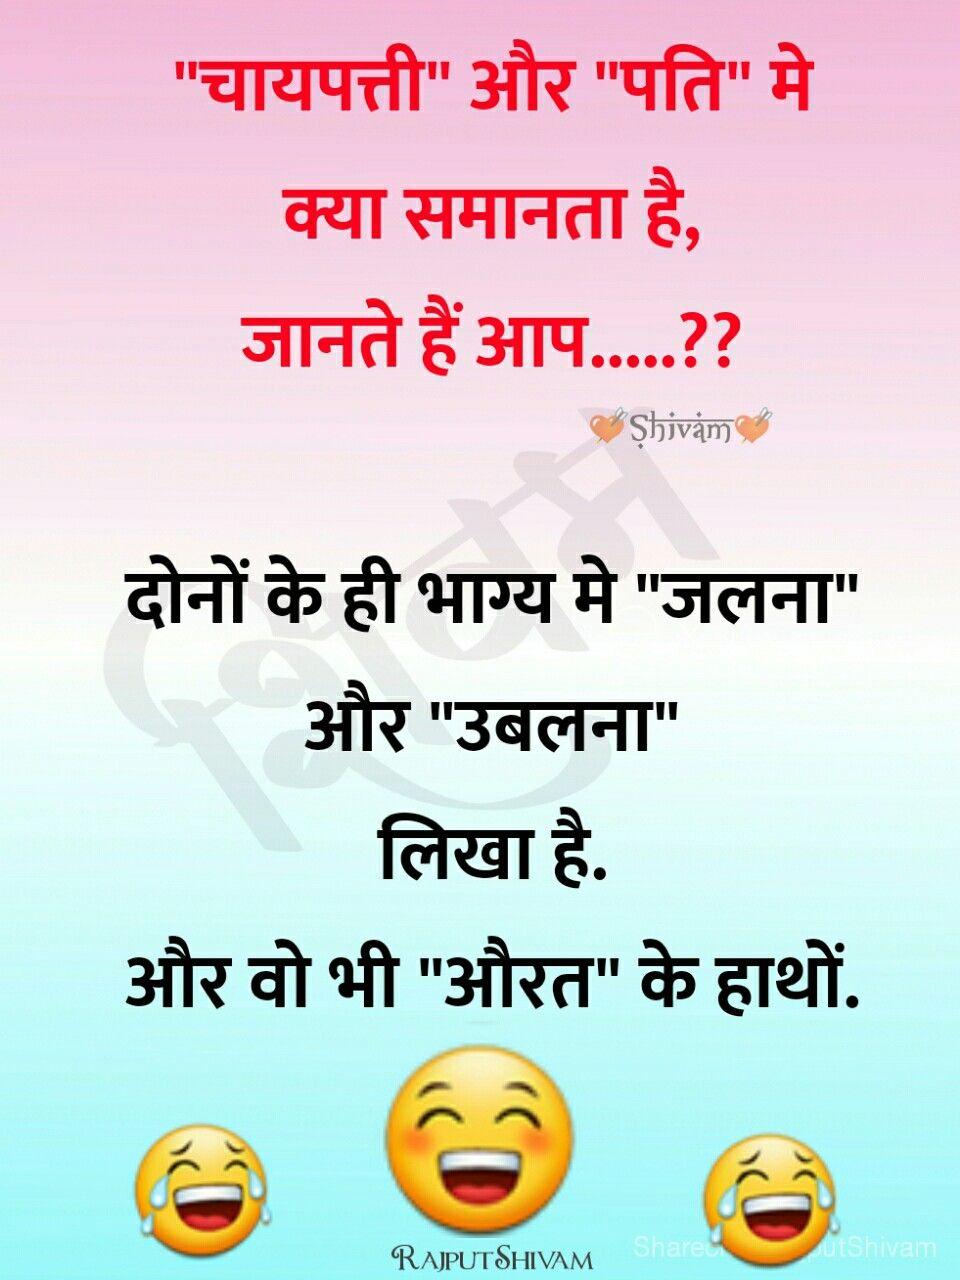 Sanjana V Singh Jokes Quotes Some Funny Jokes Fun Quotes Funny